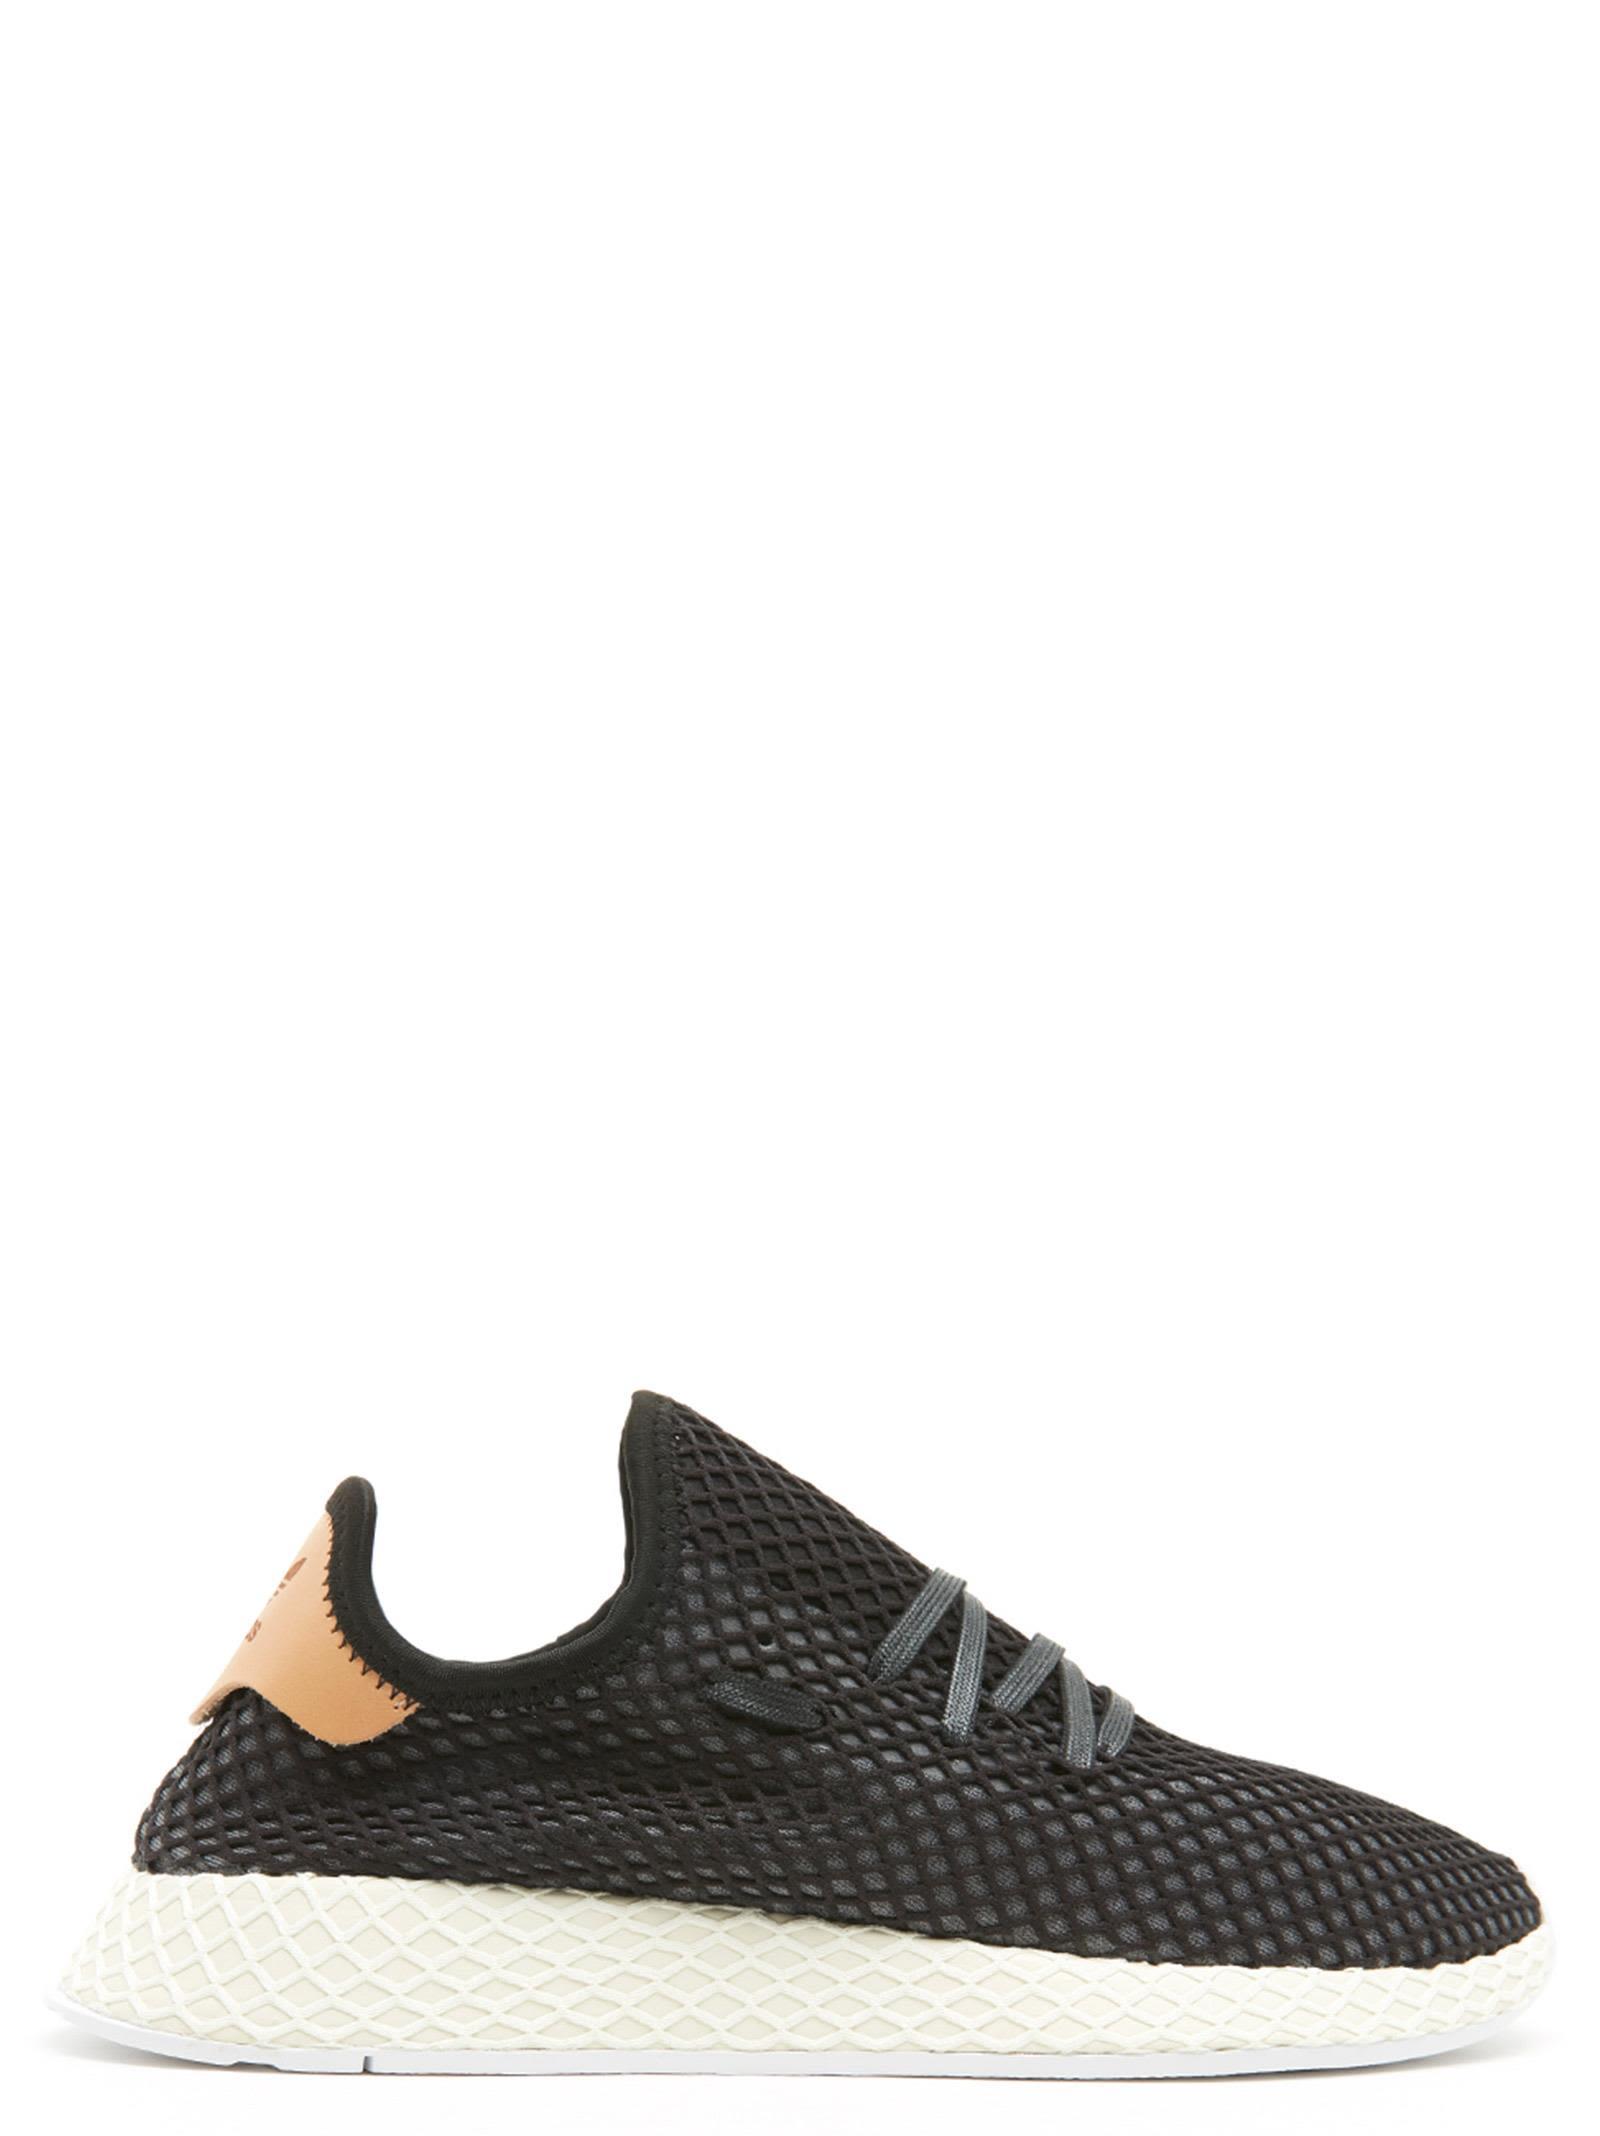 huge selection of 068cc b0040 ADIDAS ORIGINALS. Adidas Deerupt Runner Sneakers - Farfetch ...